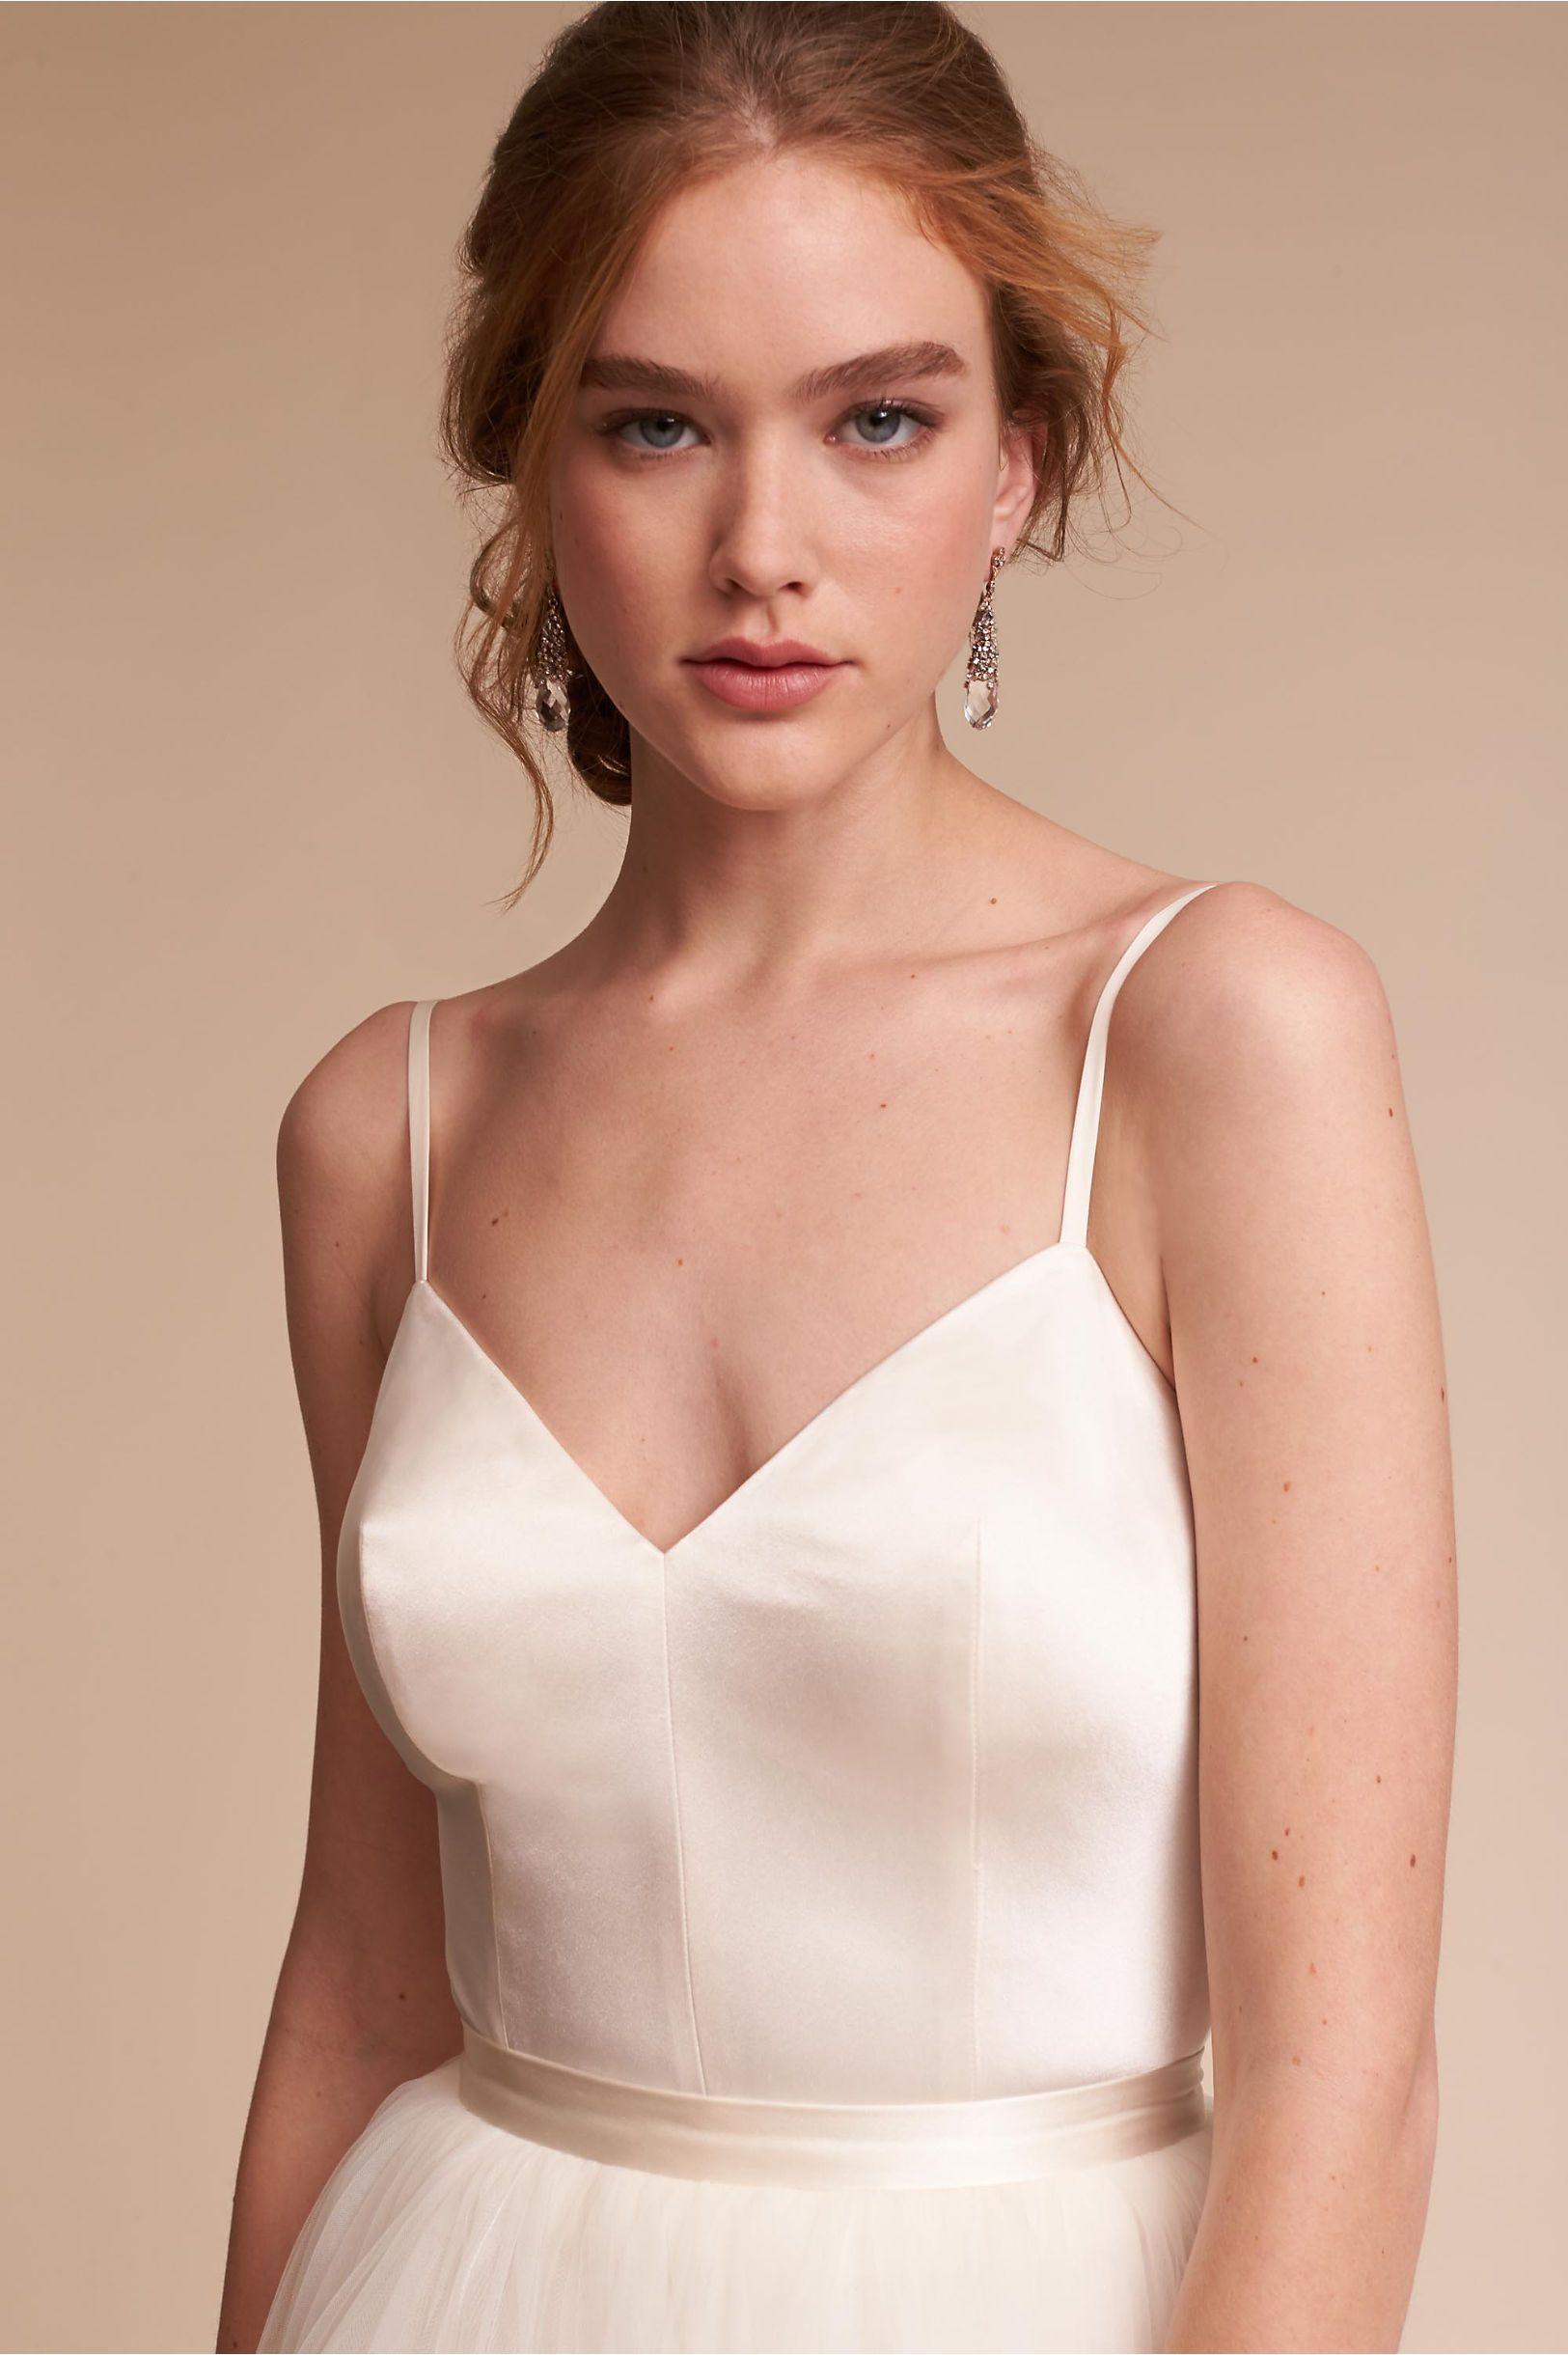 Wedding dress bodysuit  BHLDN Jewel Bodysuit u Delphi Skirt in Bride Bridal Separates